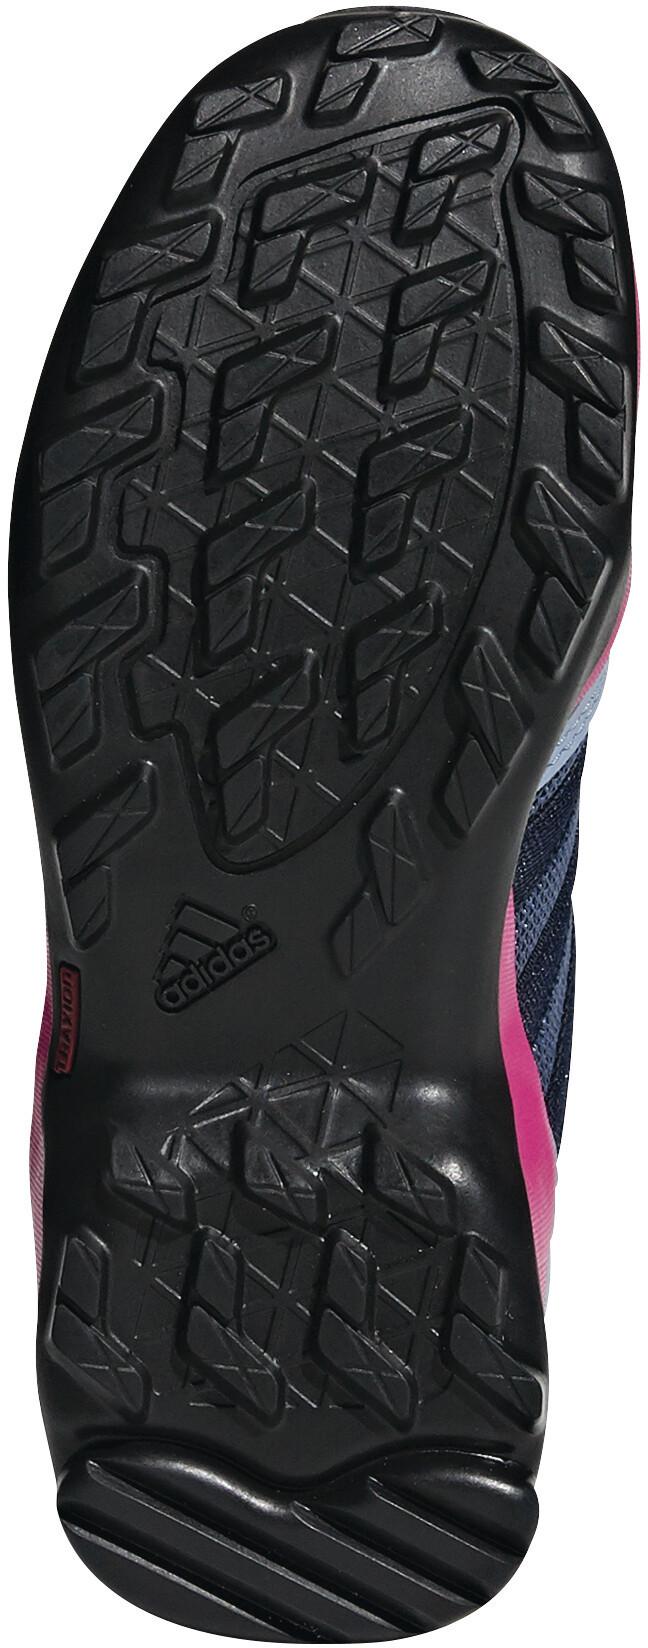 Outdoor Medio Botas Inkreal Ax2r Adidas Climaproof Corte NiñasTeck Magenta Terrex Inklegend yNnOm0wv8